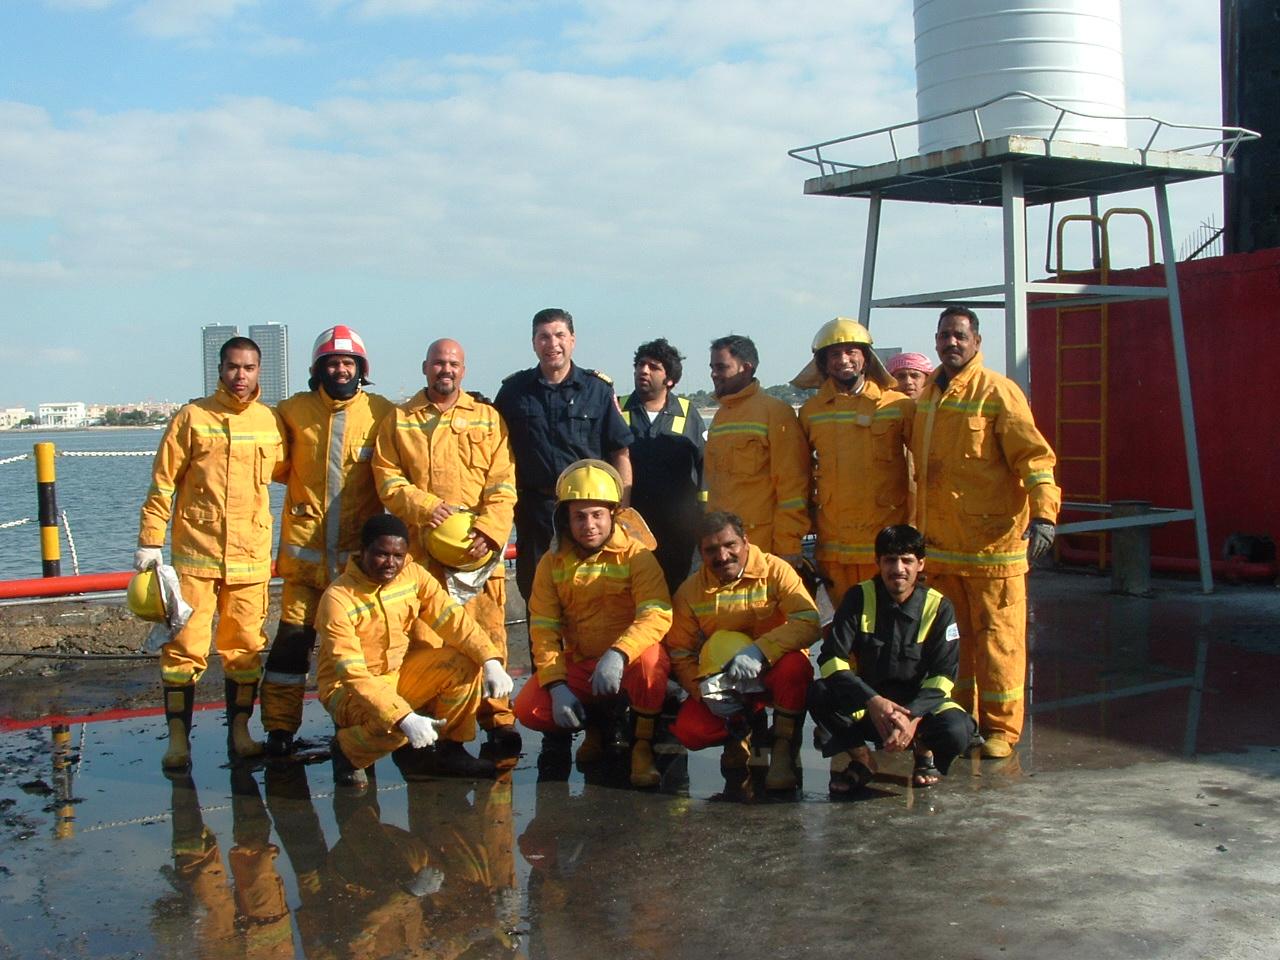 Firewise Delivers Training in Abu Dhabi, UnitedArabEmirates